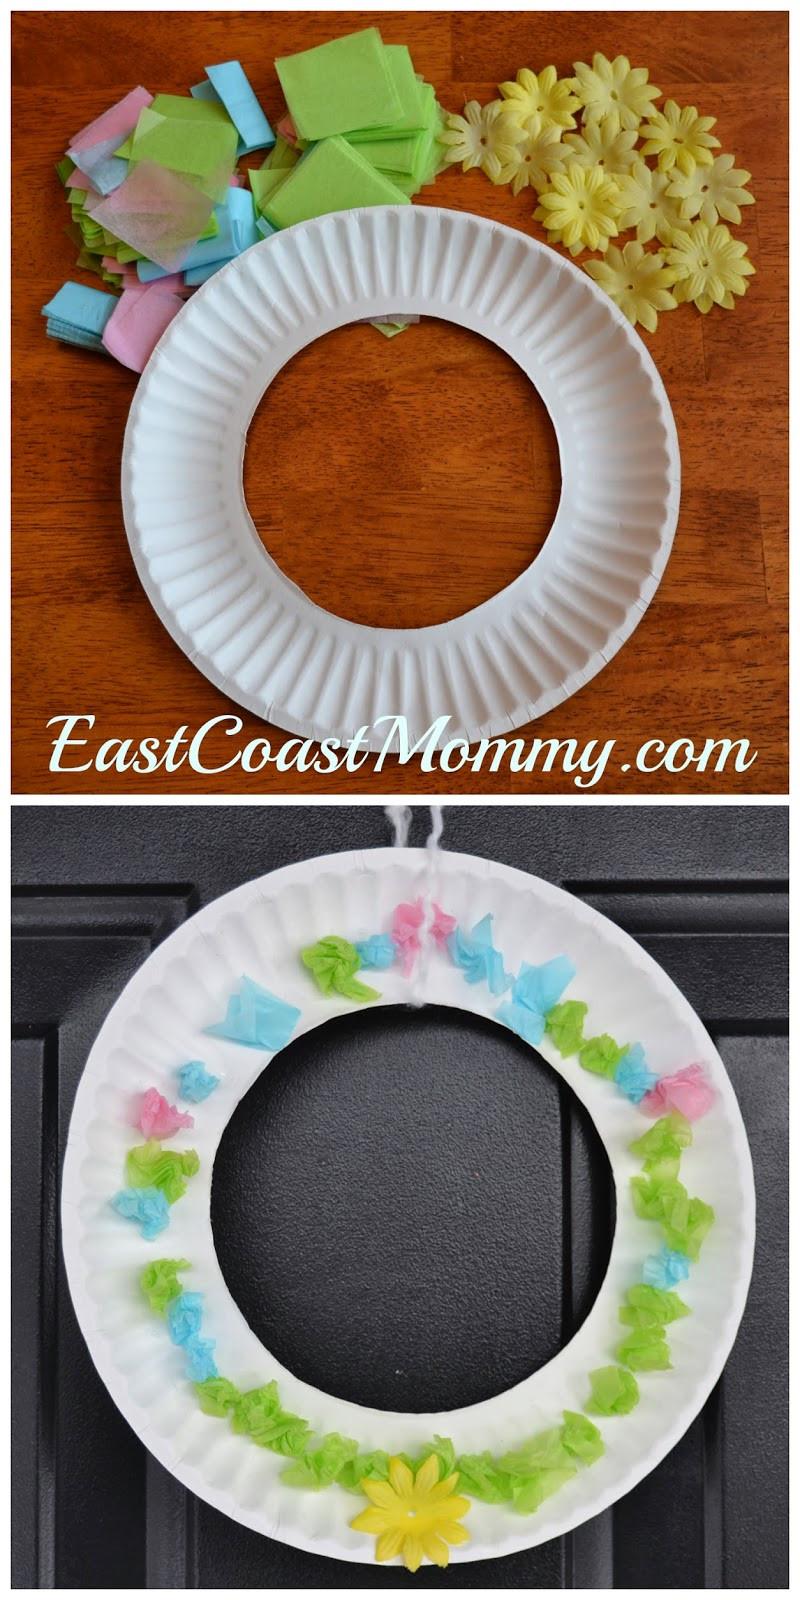 Spring Crafts Preschool  East Coast Mommy Spring Craft for Preschoolers